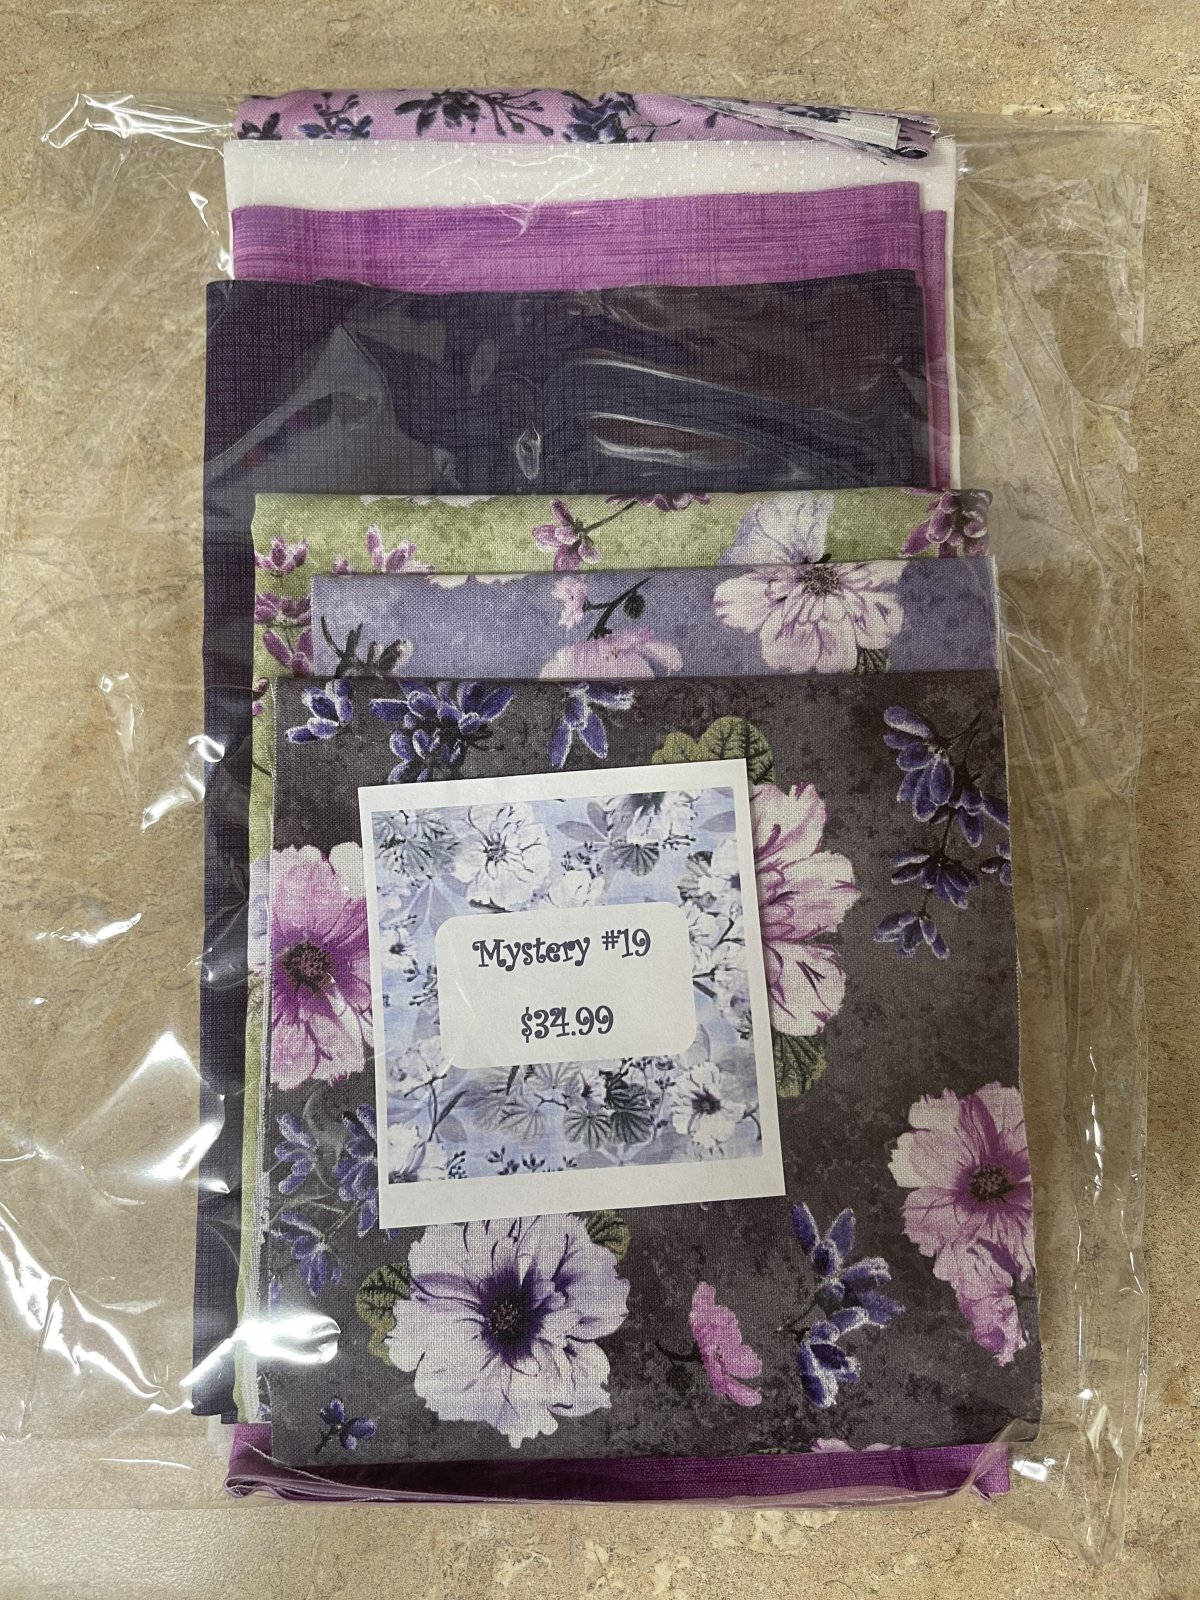 Mystery #19 Fabric Kit